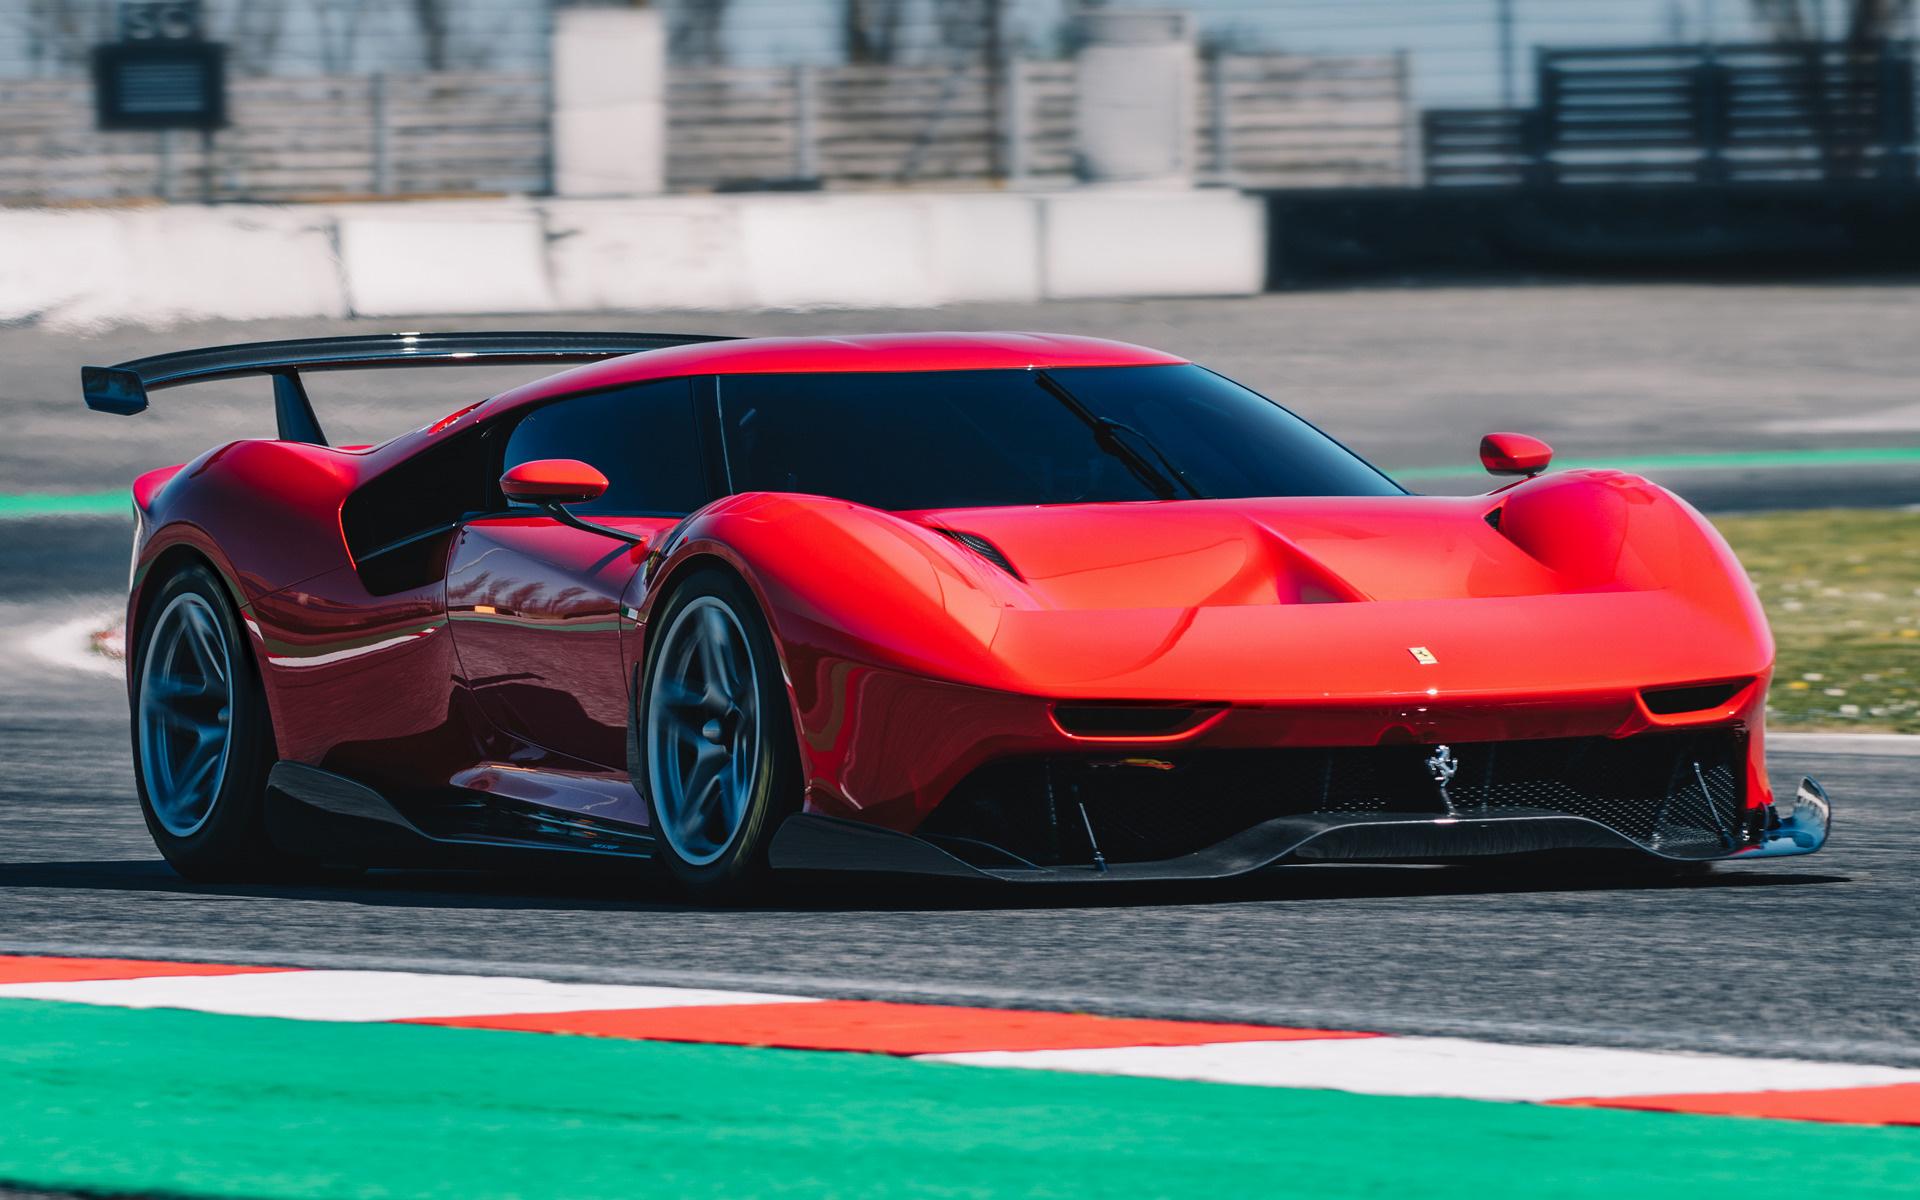 2016 Dodge Ram >> 2019 Ferrari P80/C - Wallpapers and HD Images | Car Pixel